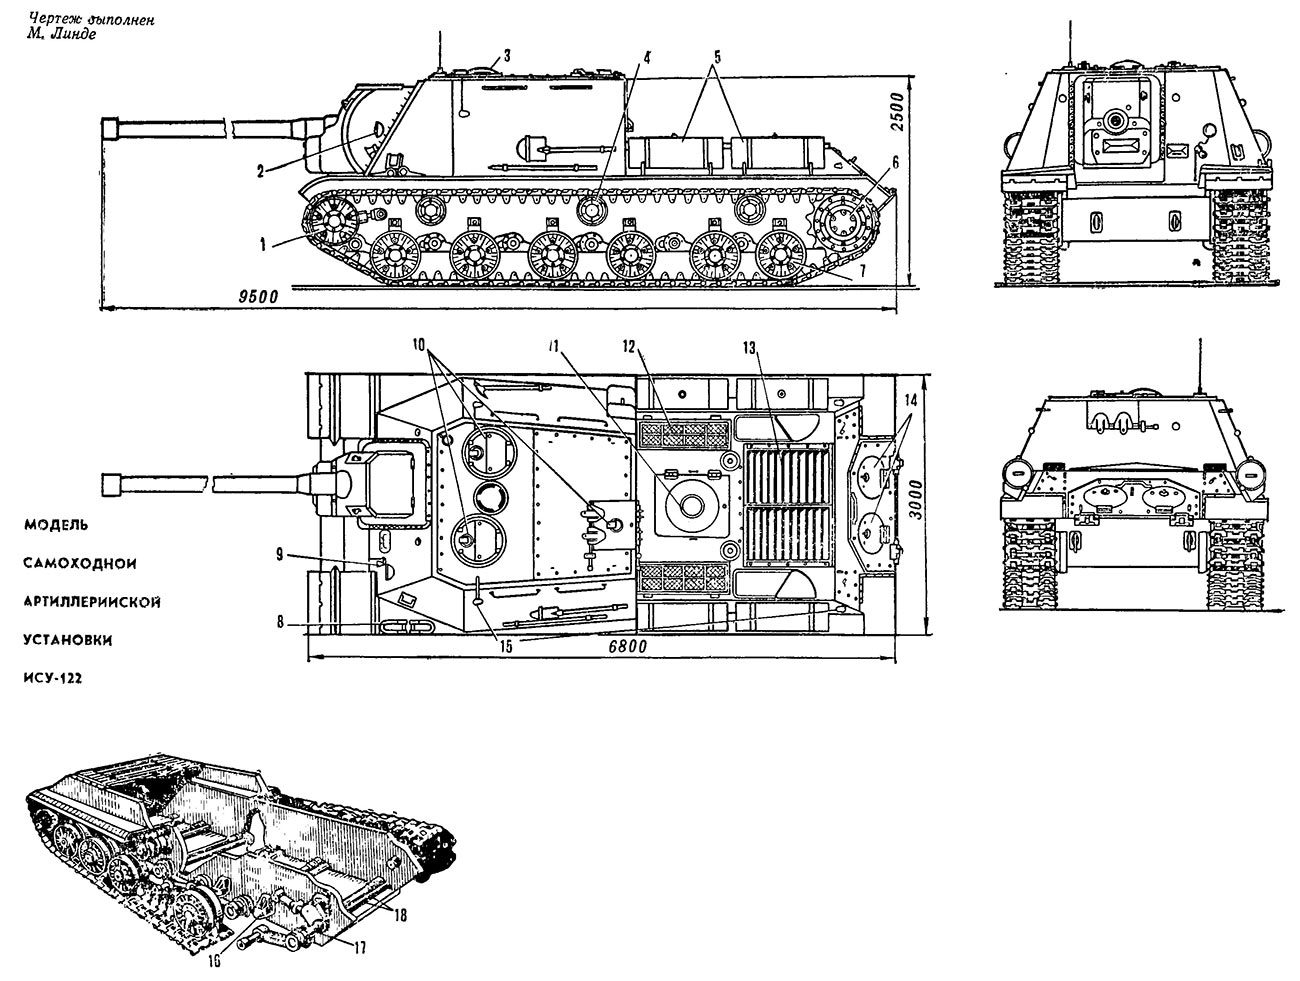 Чертеж САУ ИСУ-122